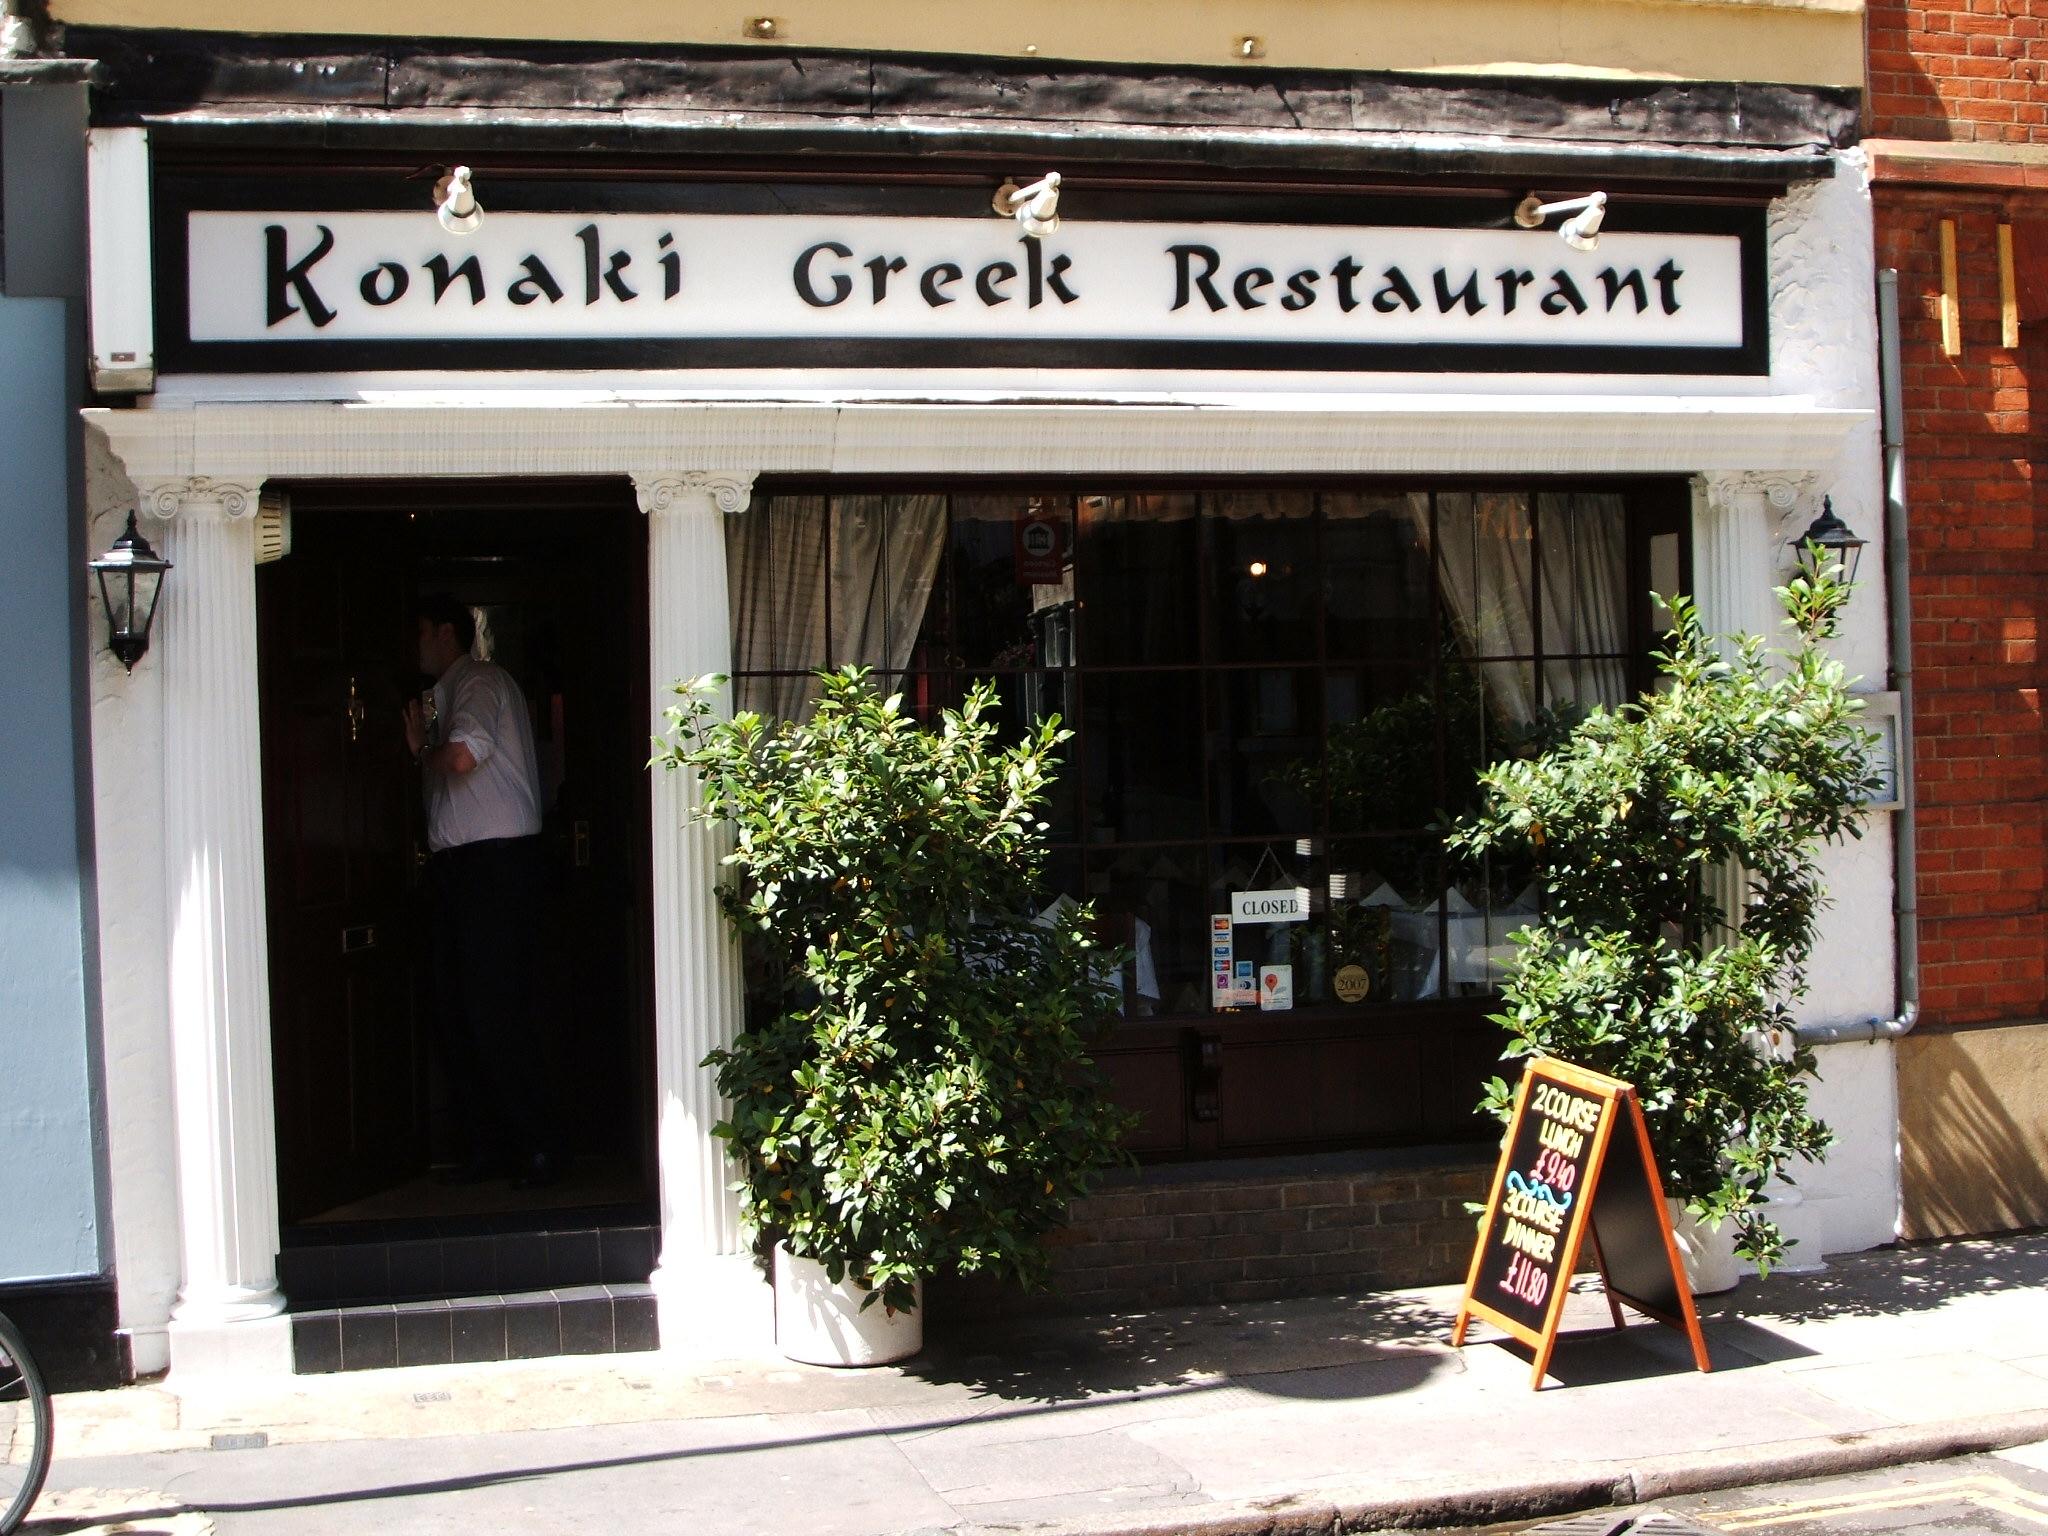 Konaki Greek Restaurant London